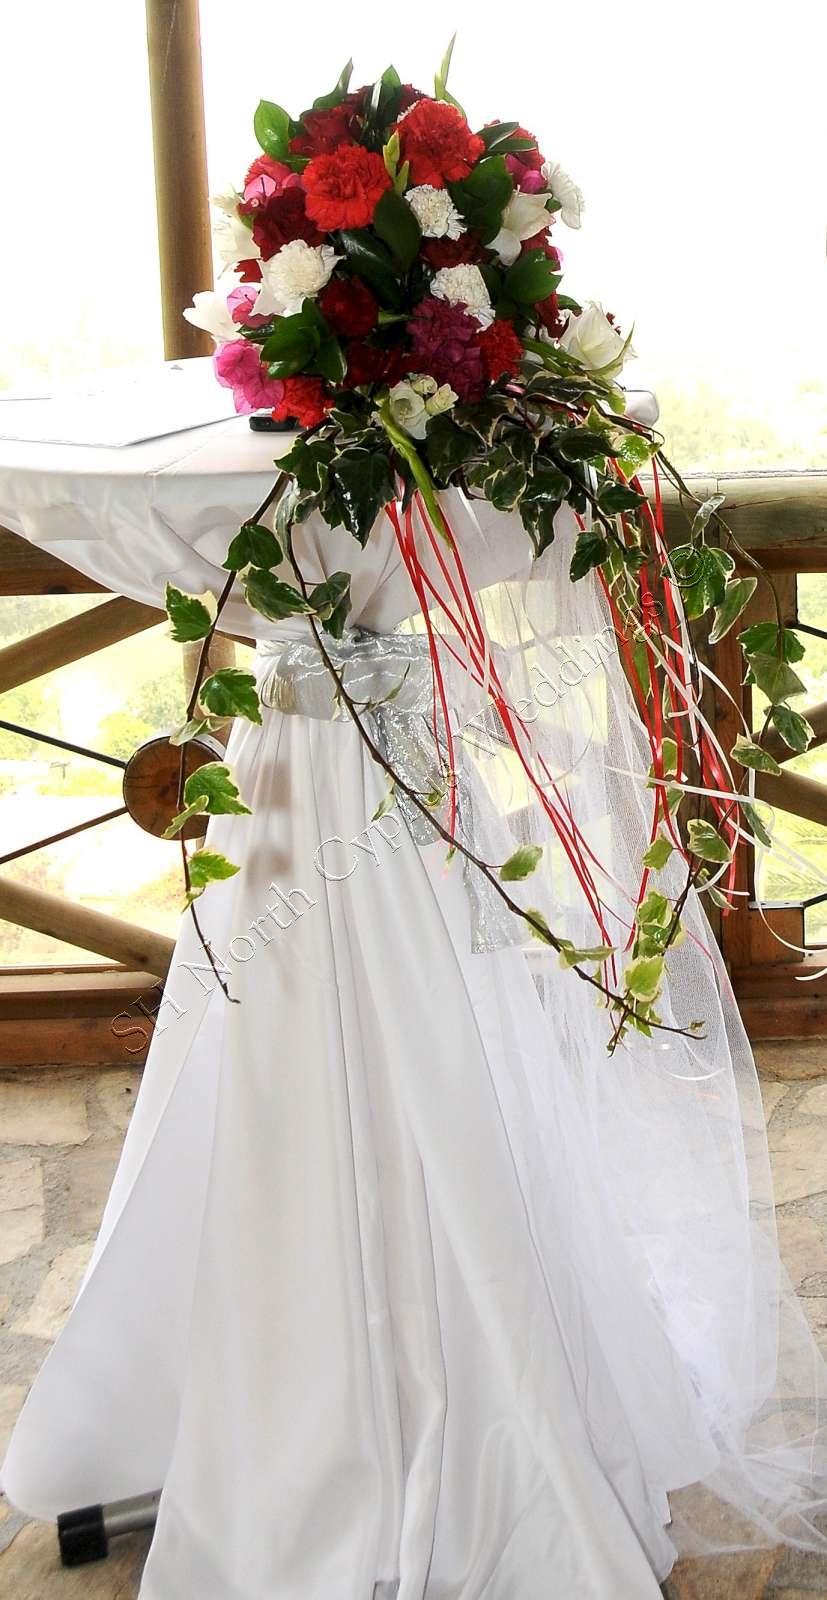 North Cyprus wedding flowers (92)